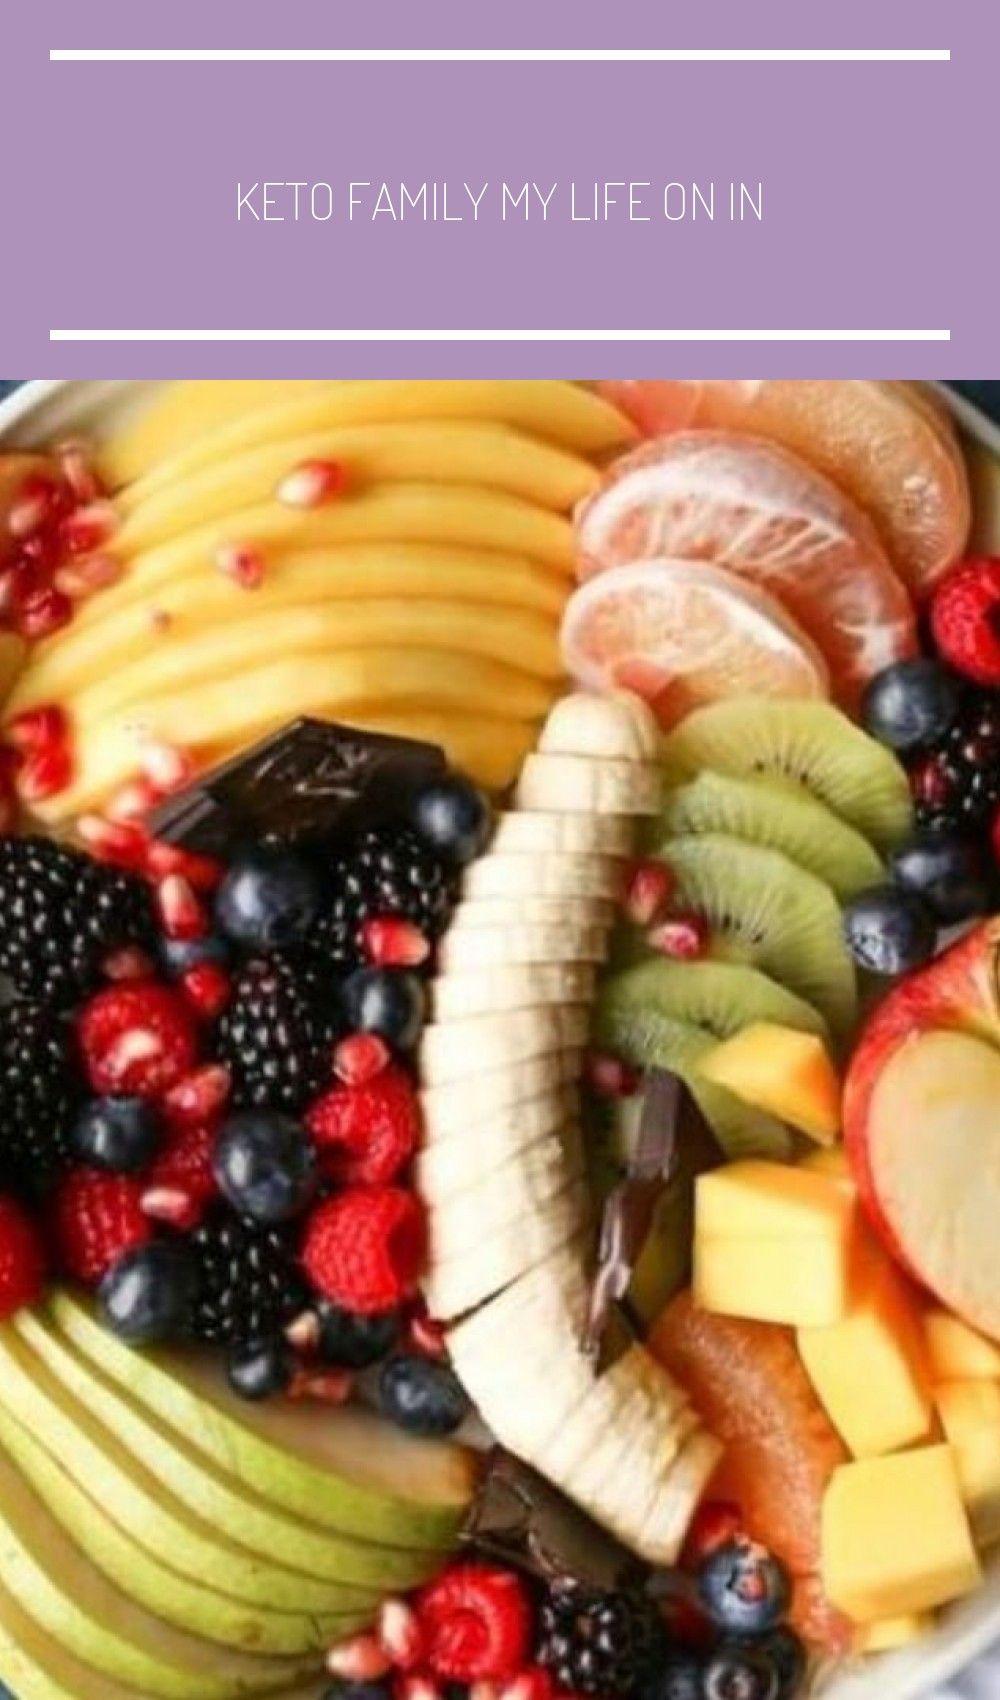 Keto family my life on instagram plant based diet meal